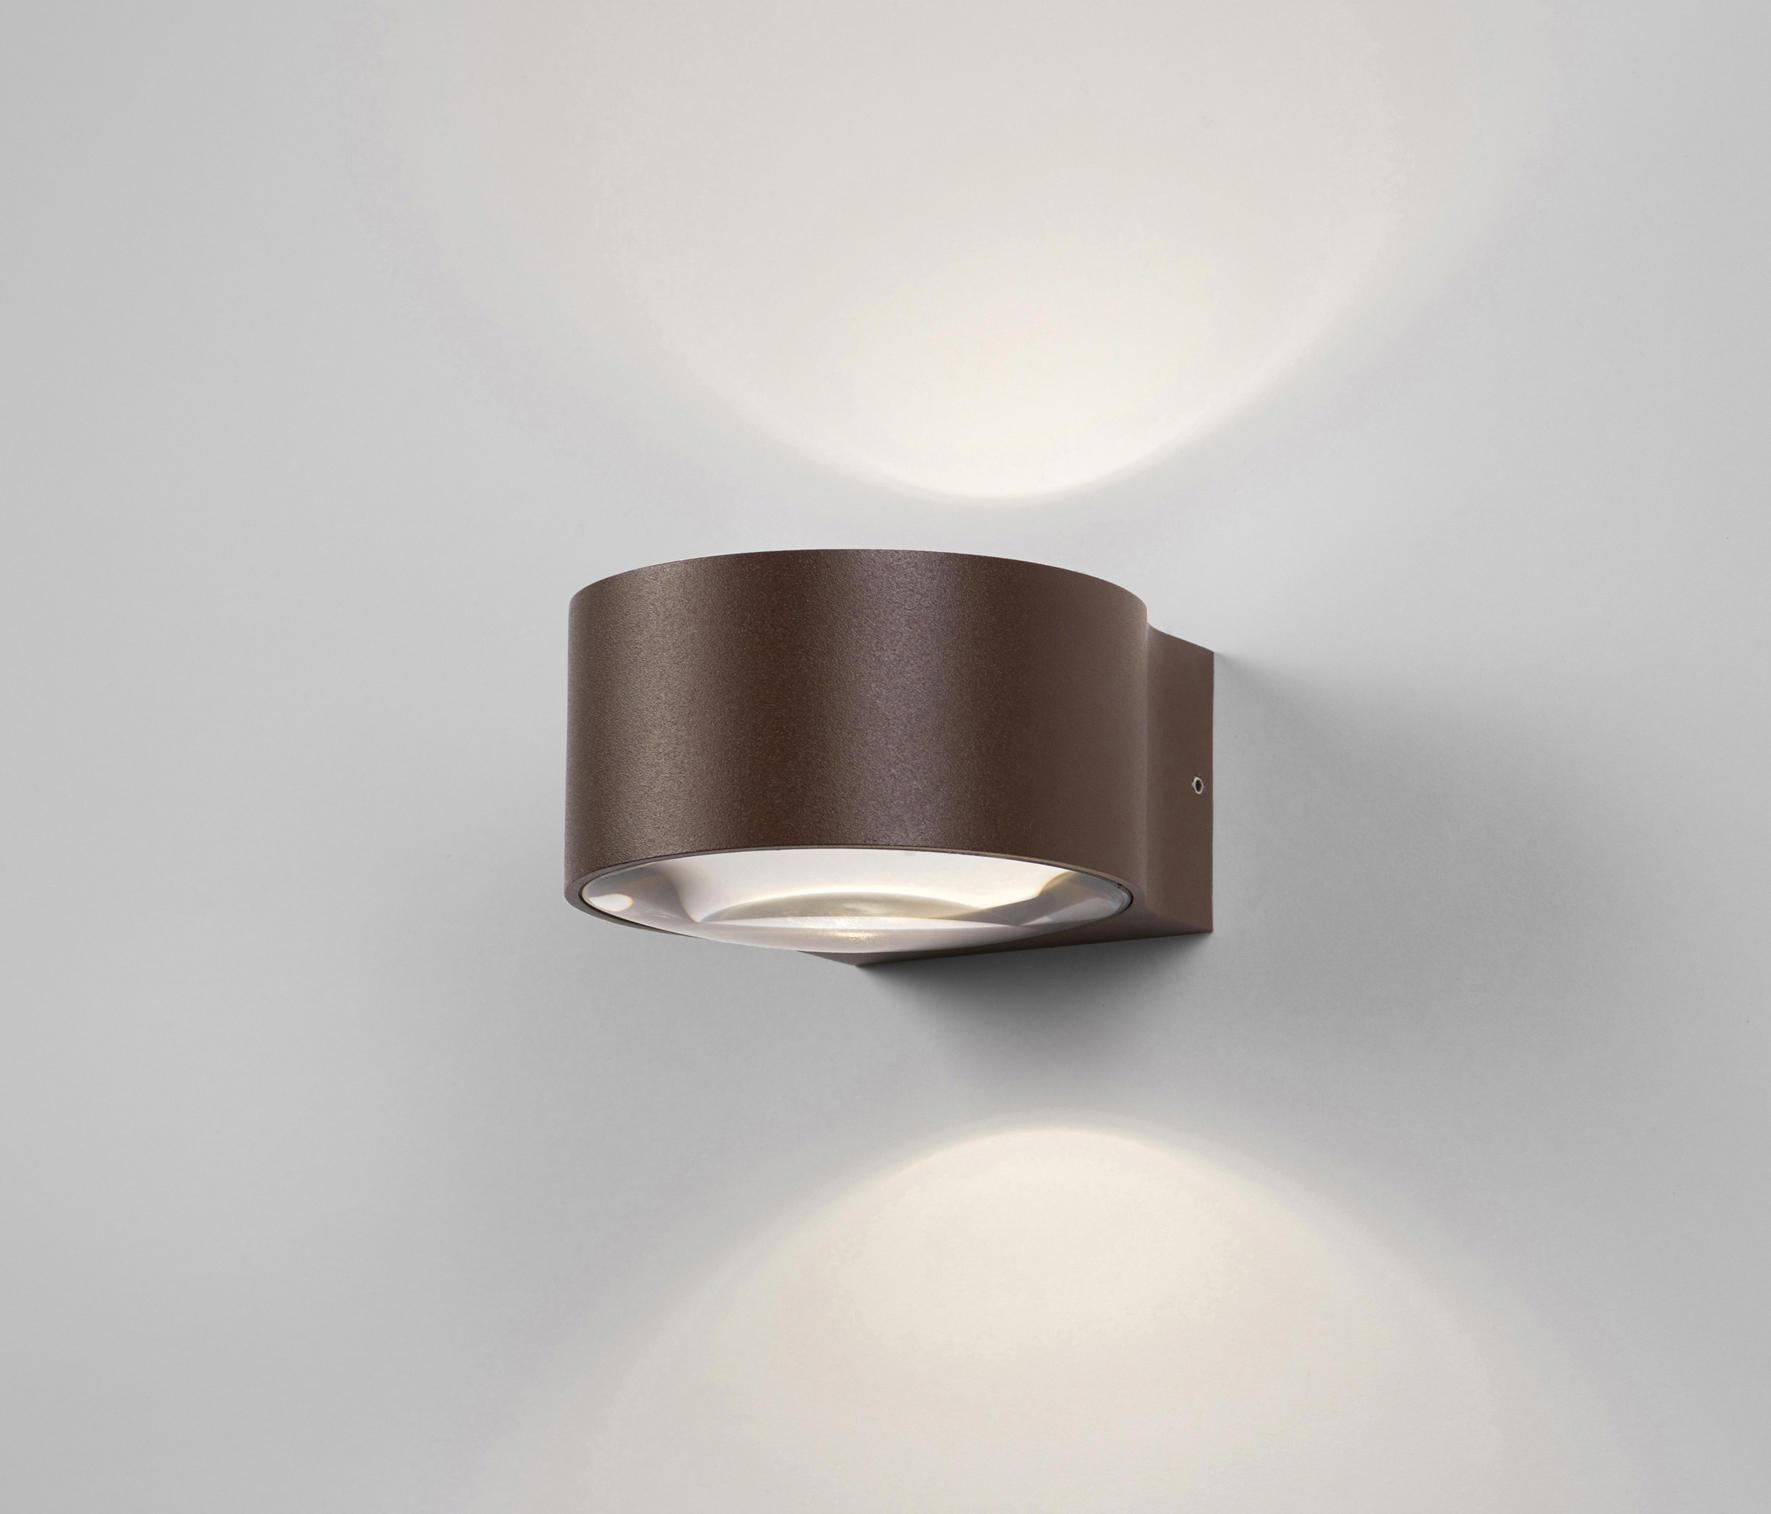 orbit lighting lighting ideas. Black Bedroom Furniture Sets. Home Design Ideas